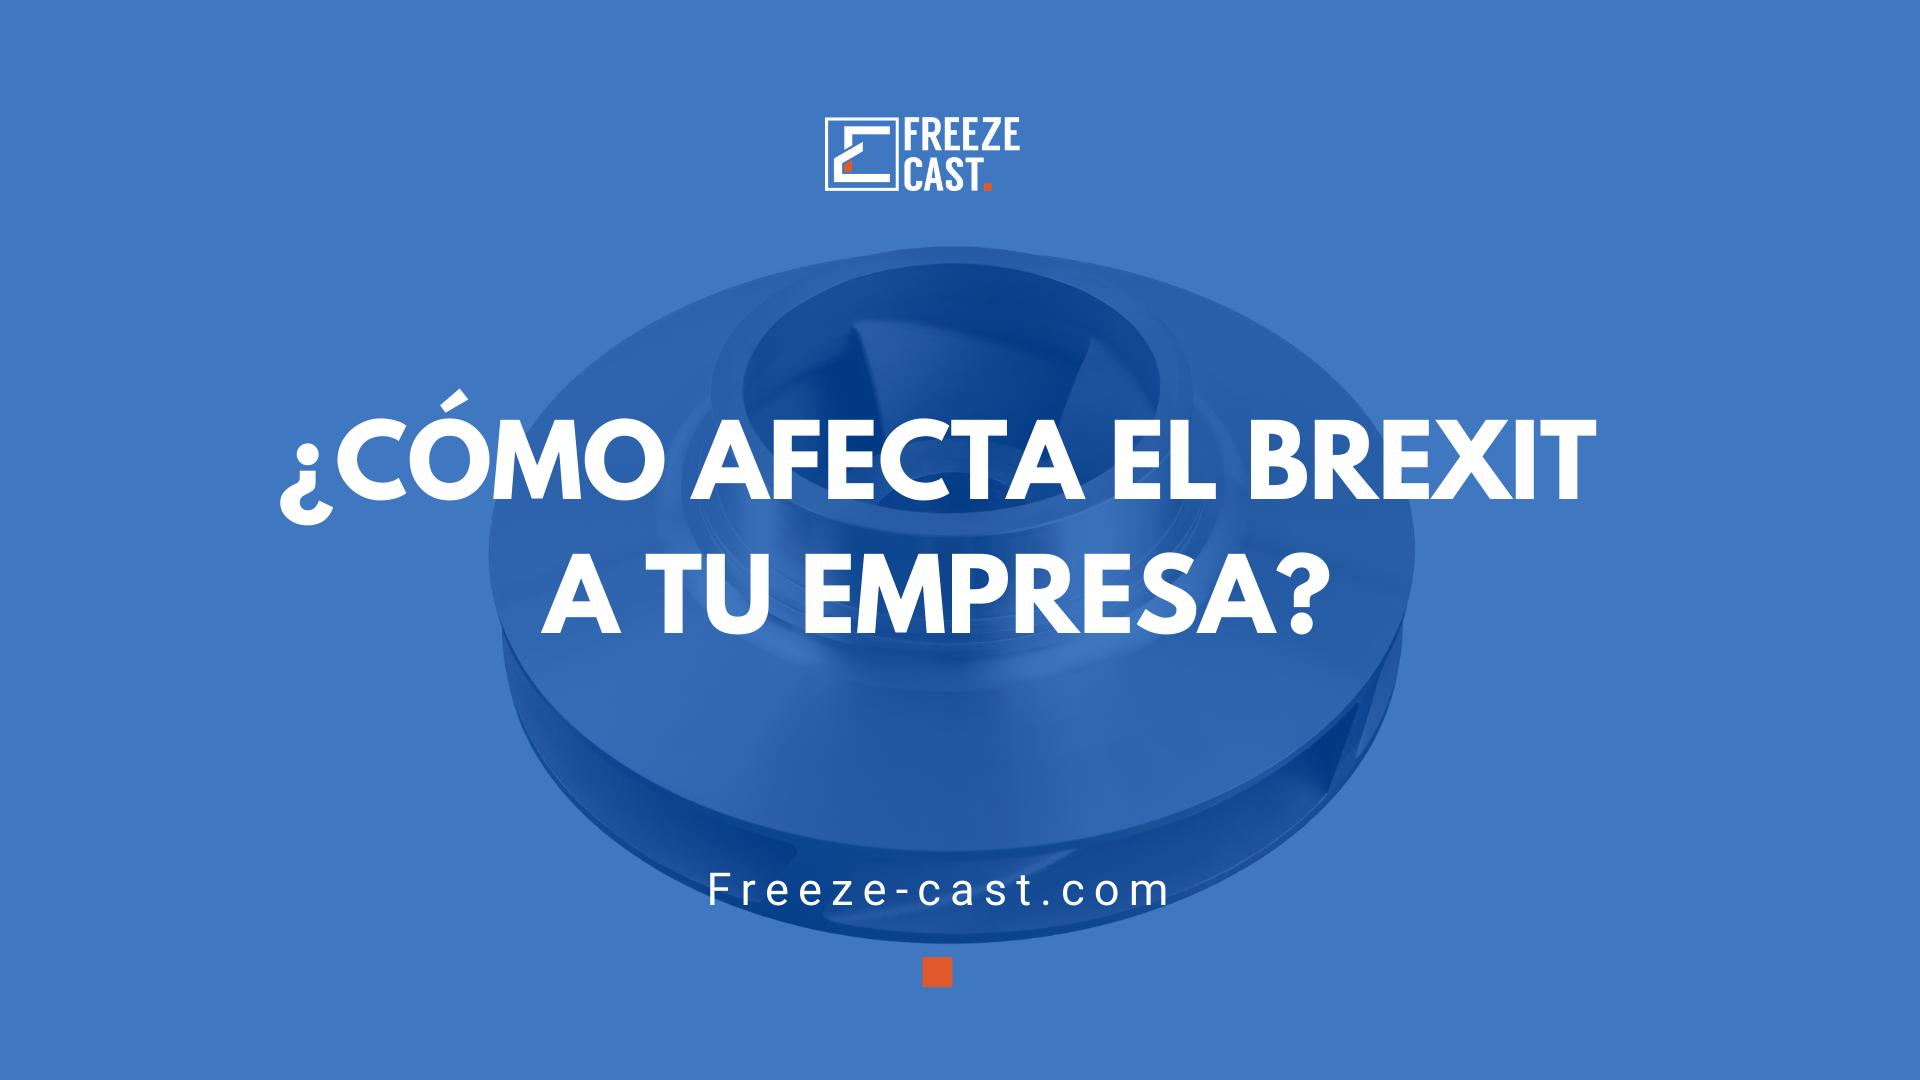 ¿Cómo afecta el BREXIT a tu empresa?